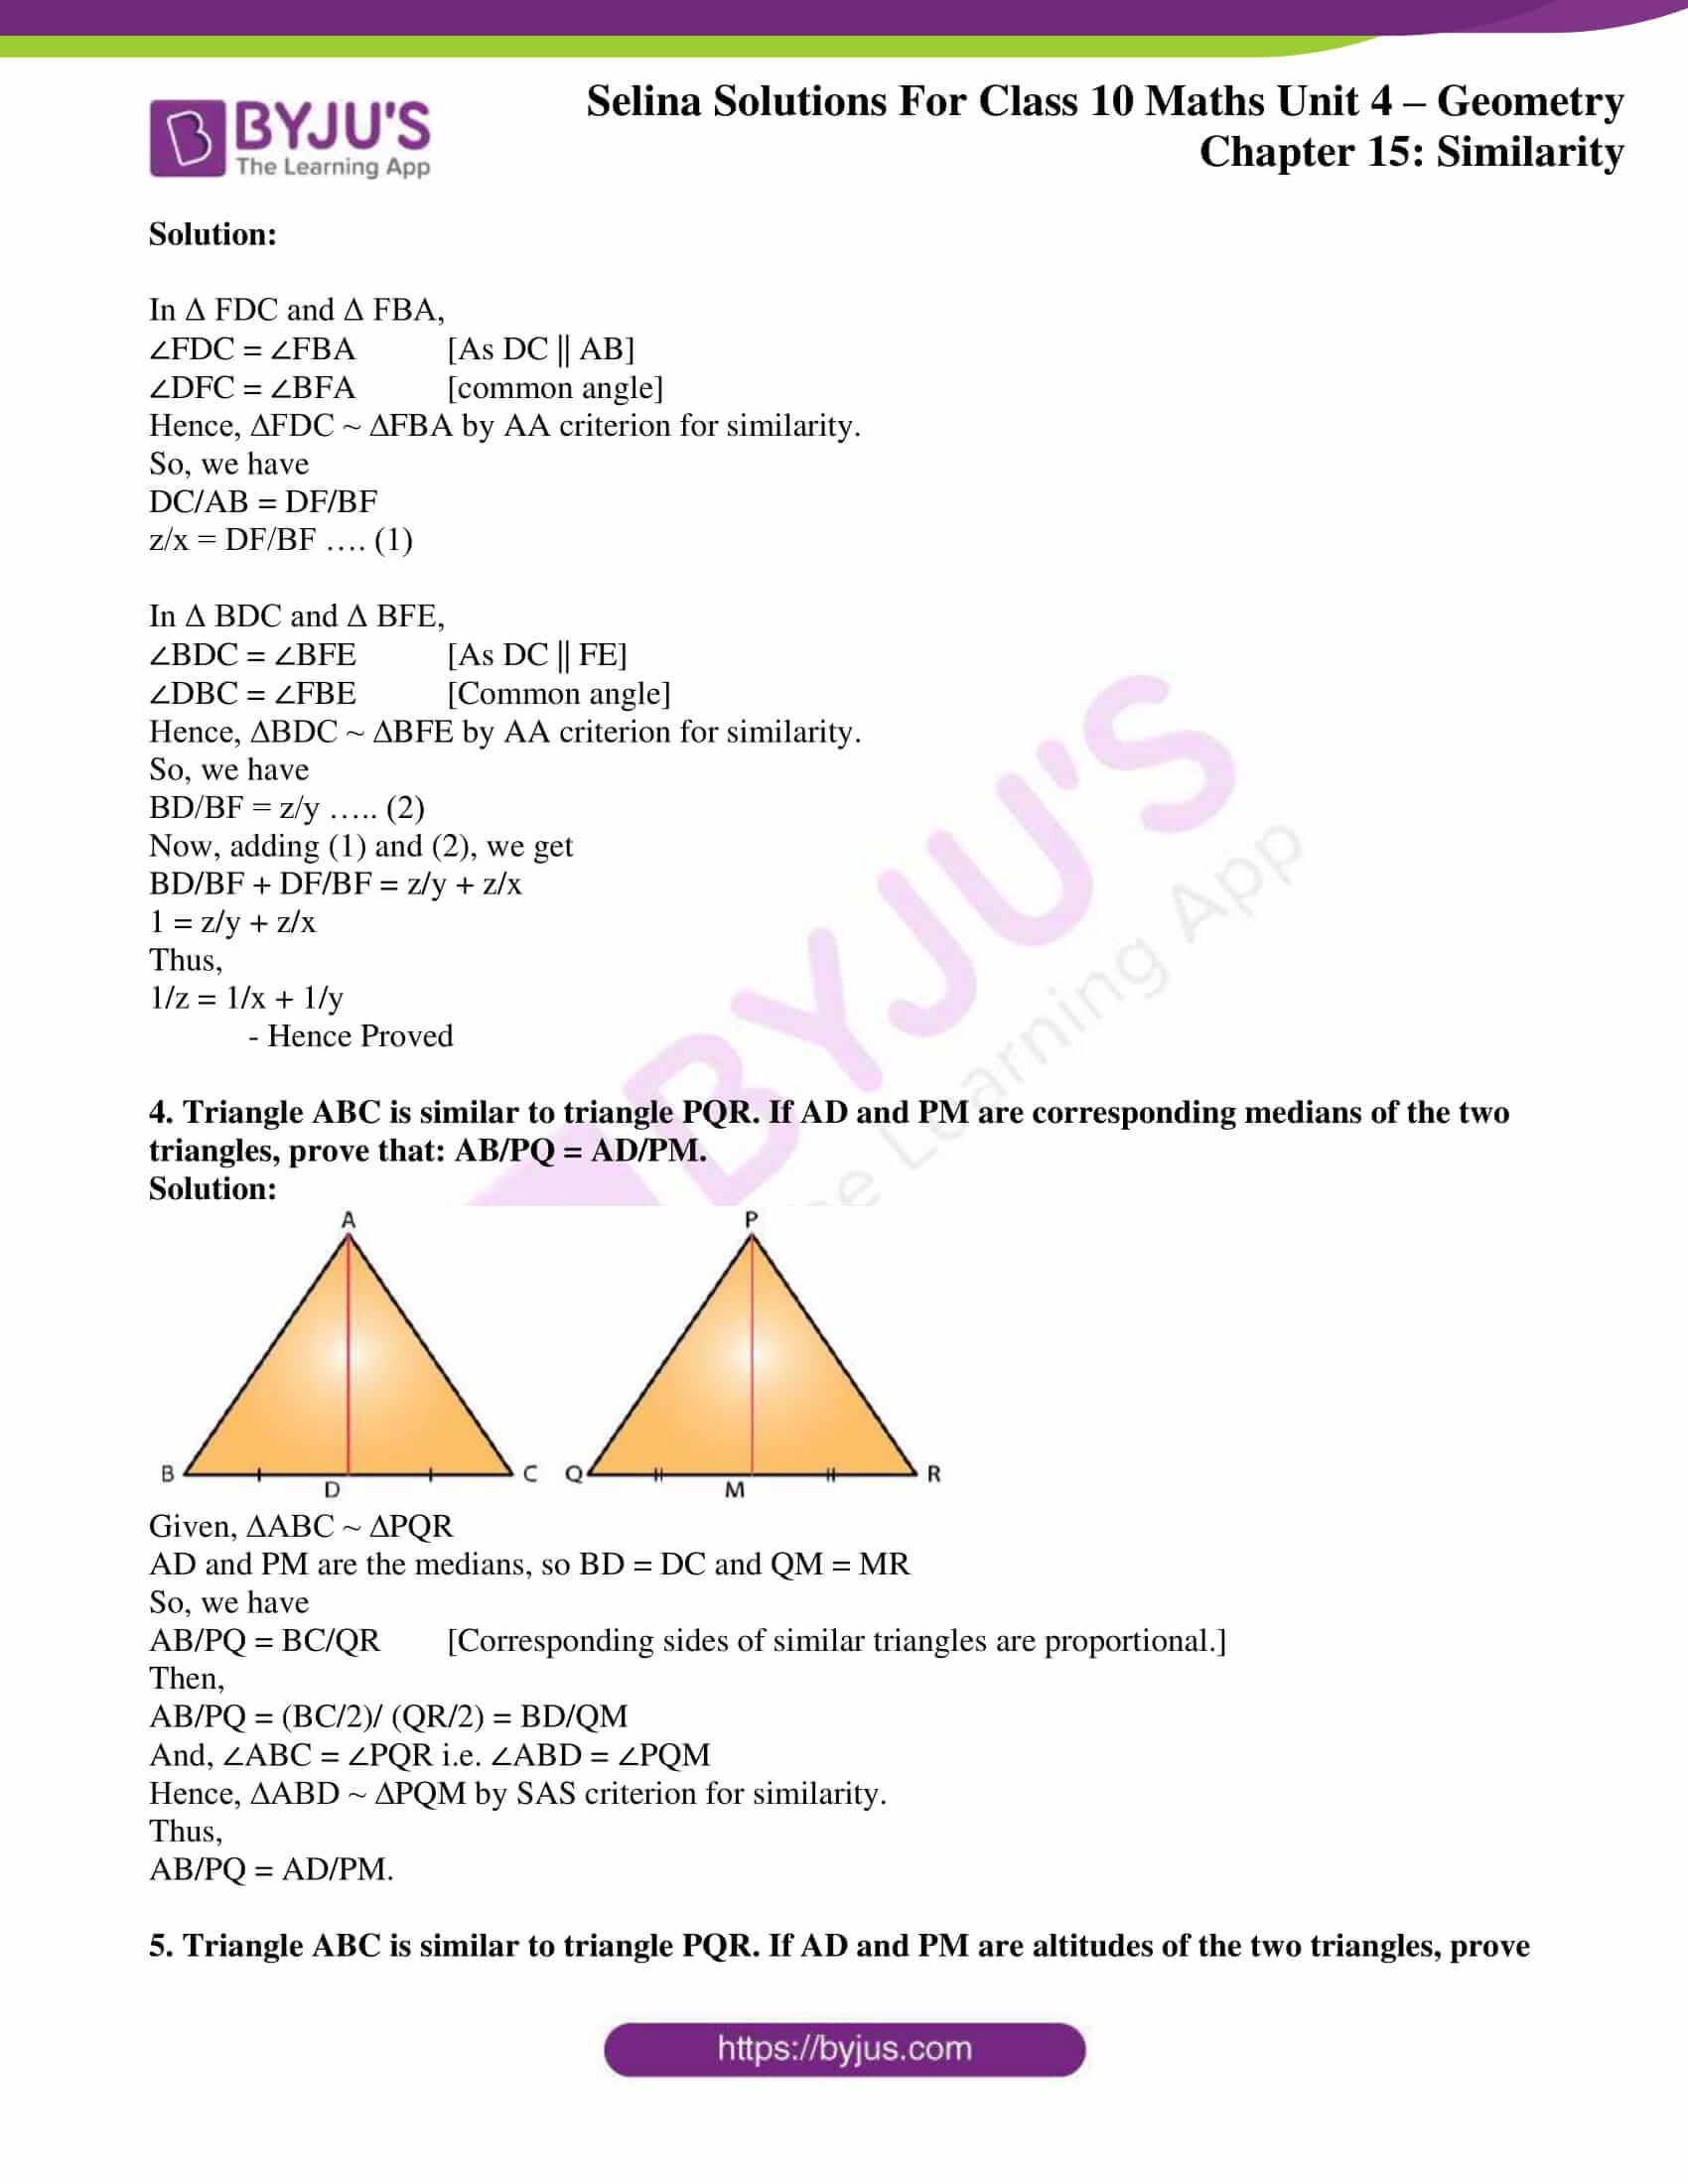 selina-sol-maths-class-10-ch-15-ex-e-3